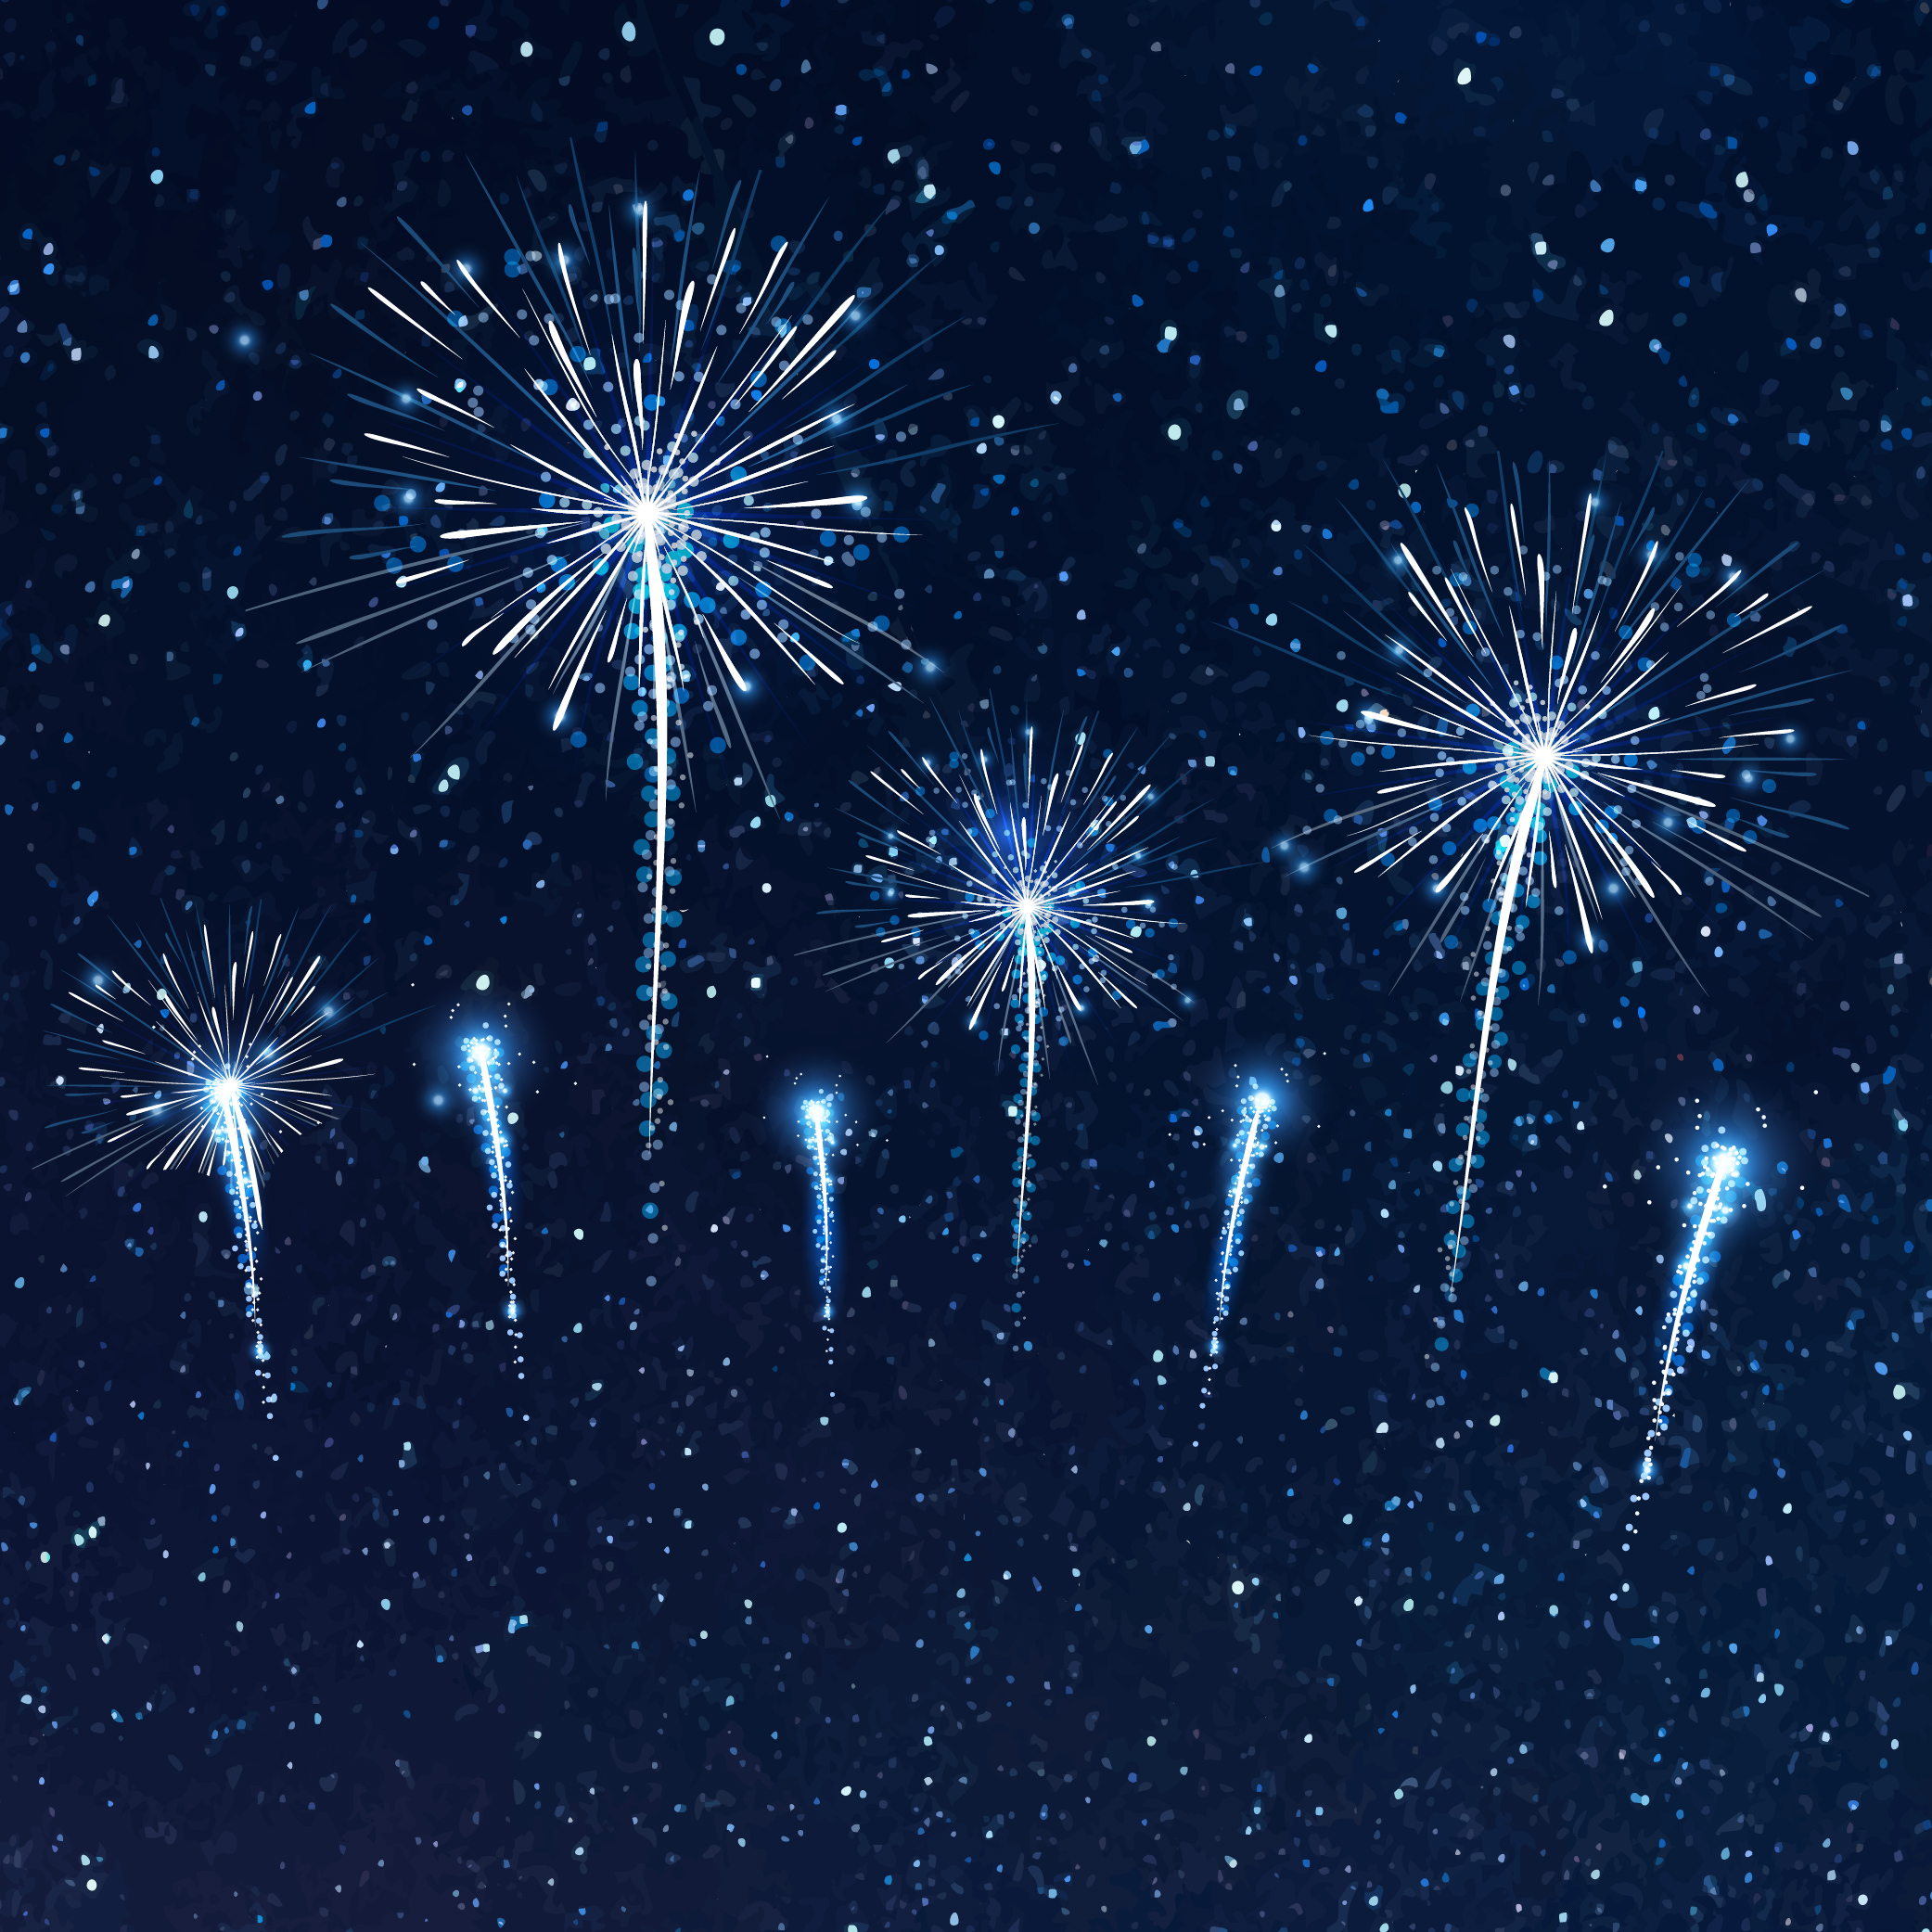 starry sky fireworks image